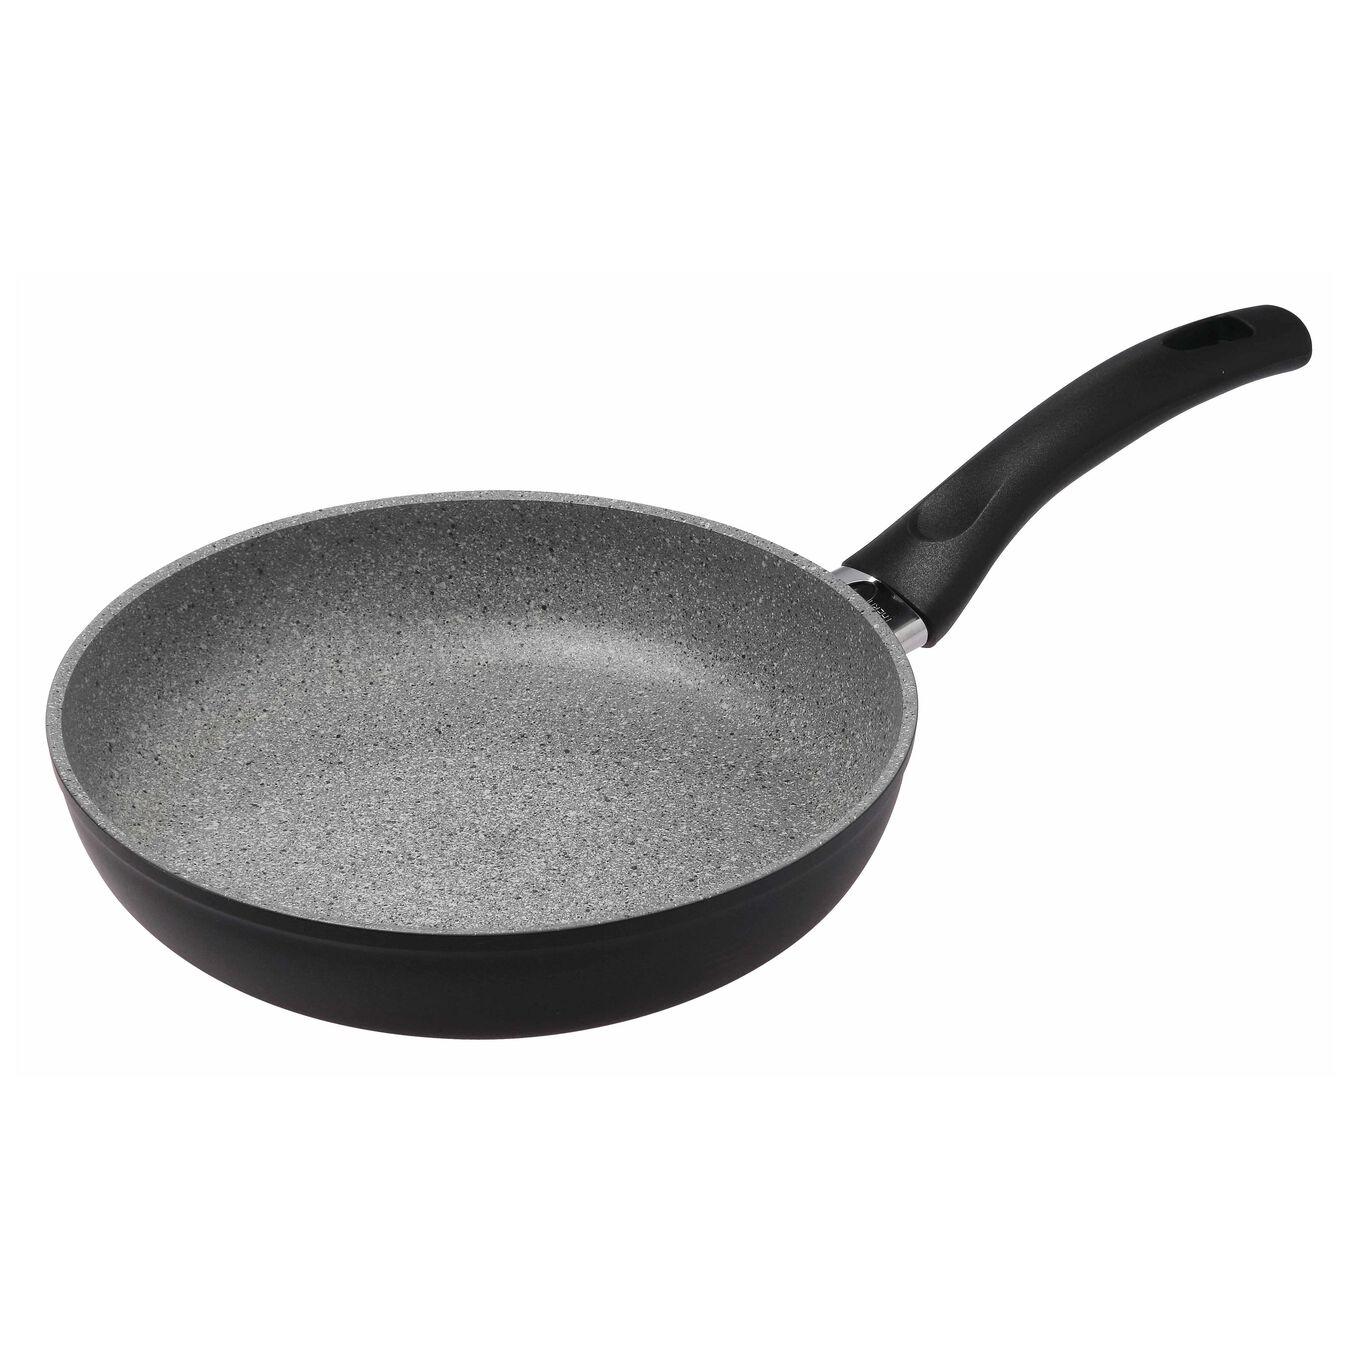 0.1 ml Aluminum round Saucier and sauteuse, grey,,large 1